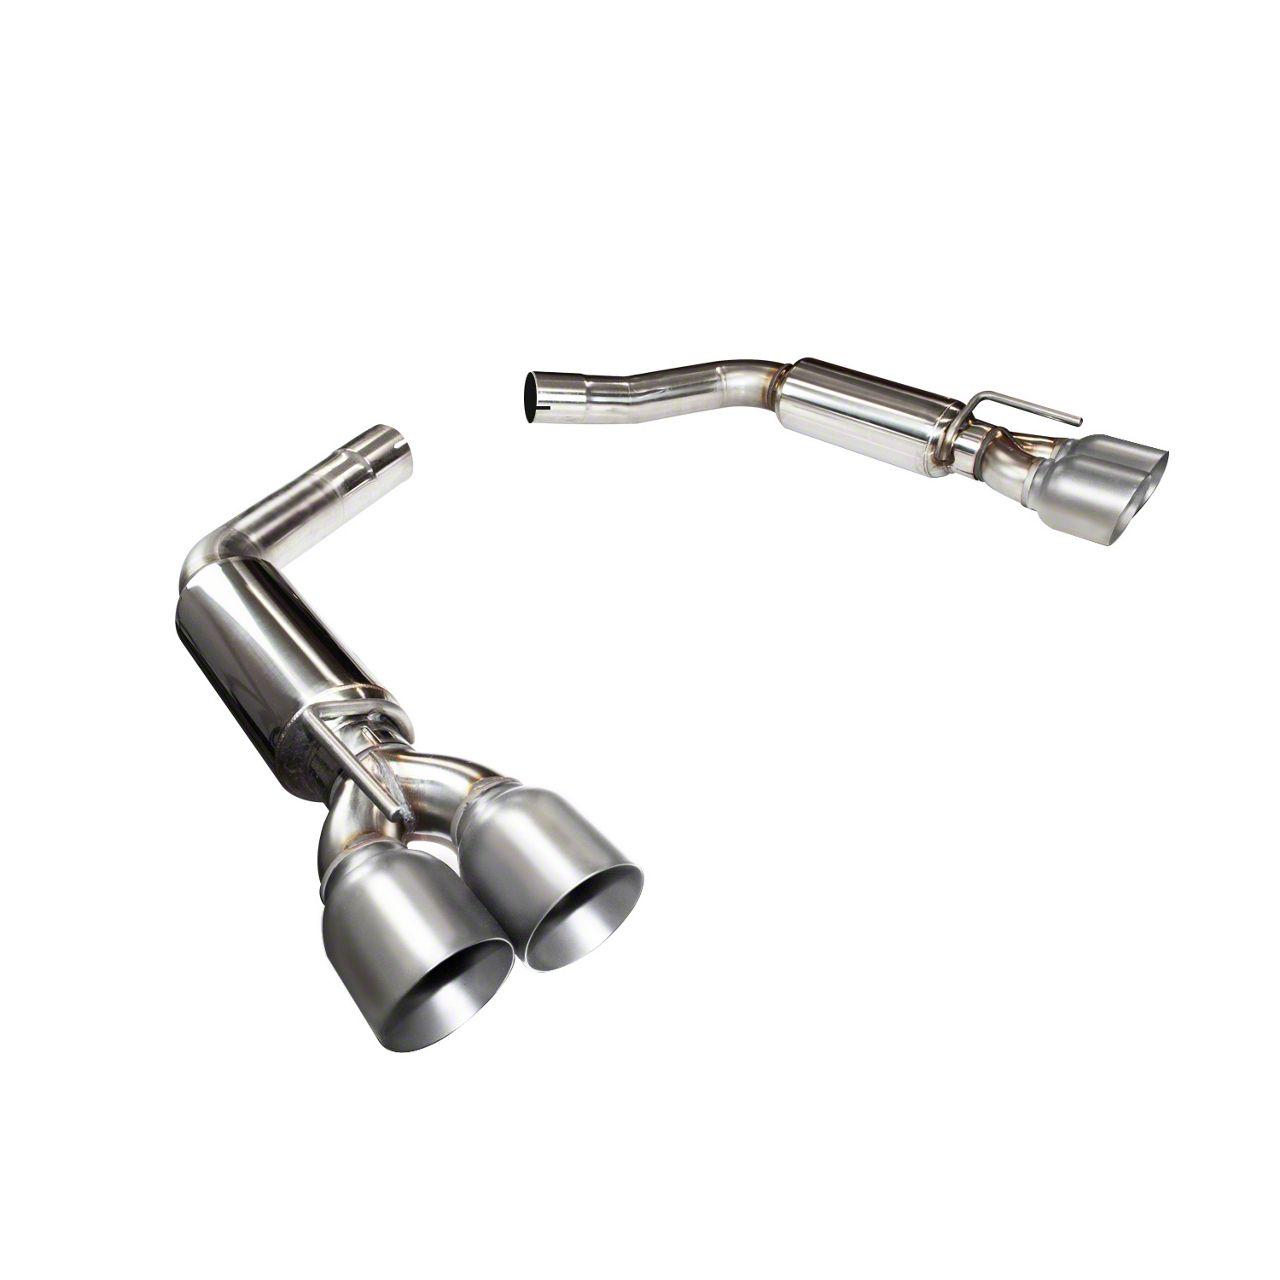 Kooks Axle-Back Exhaust w/ Polished Tips (15-19 6.2L HEMI)